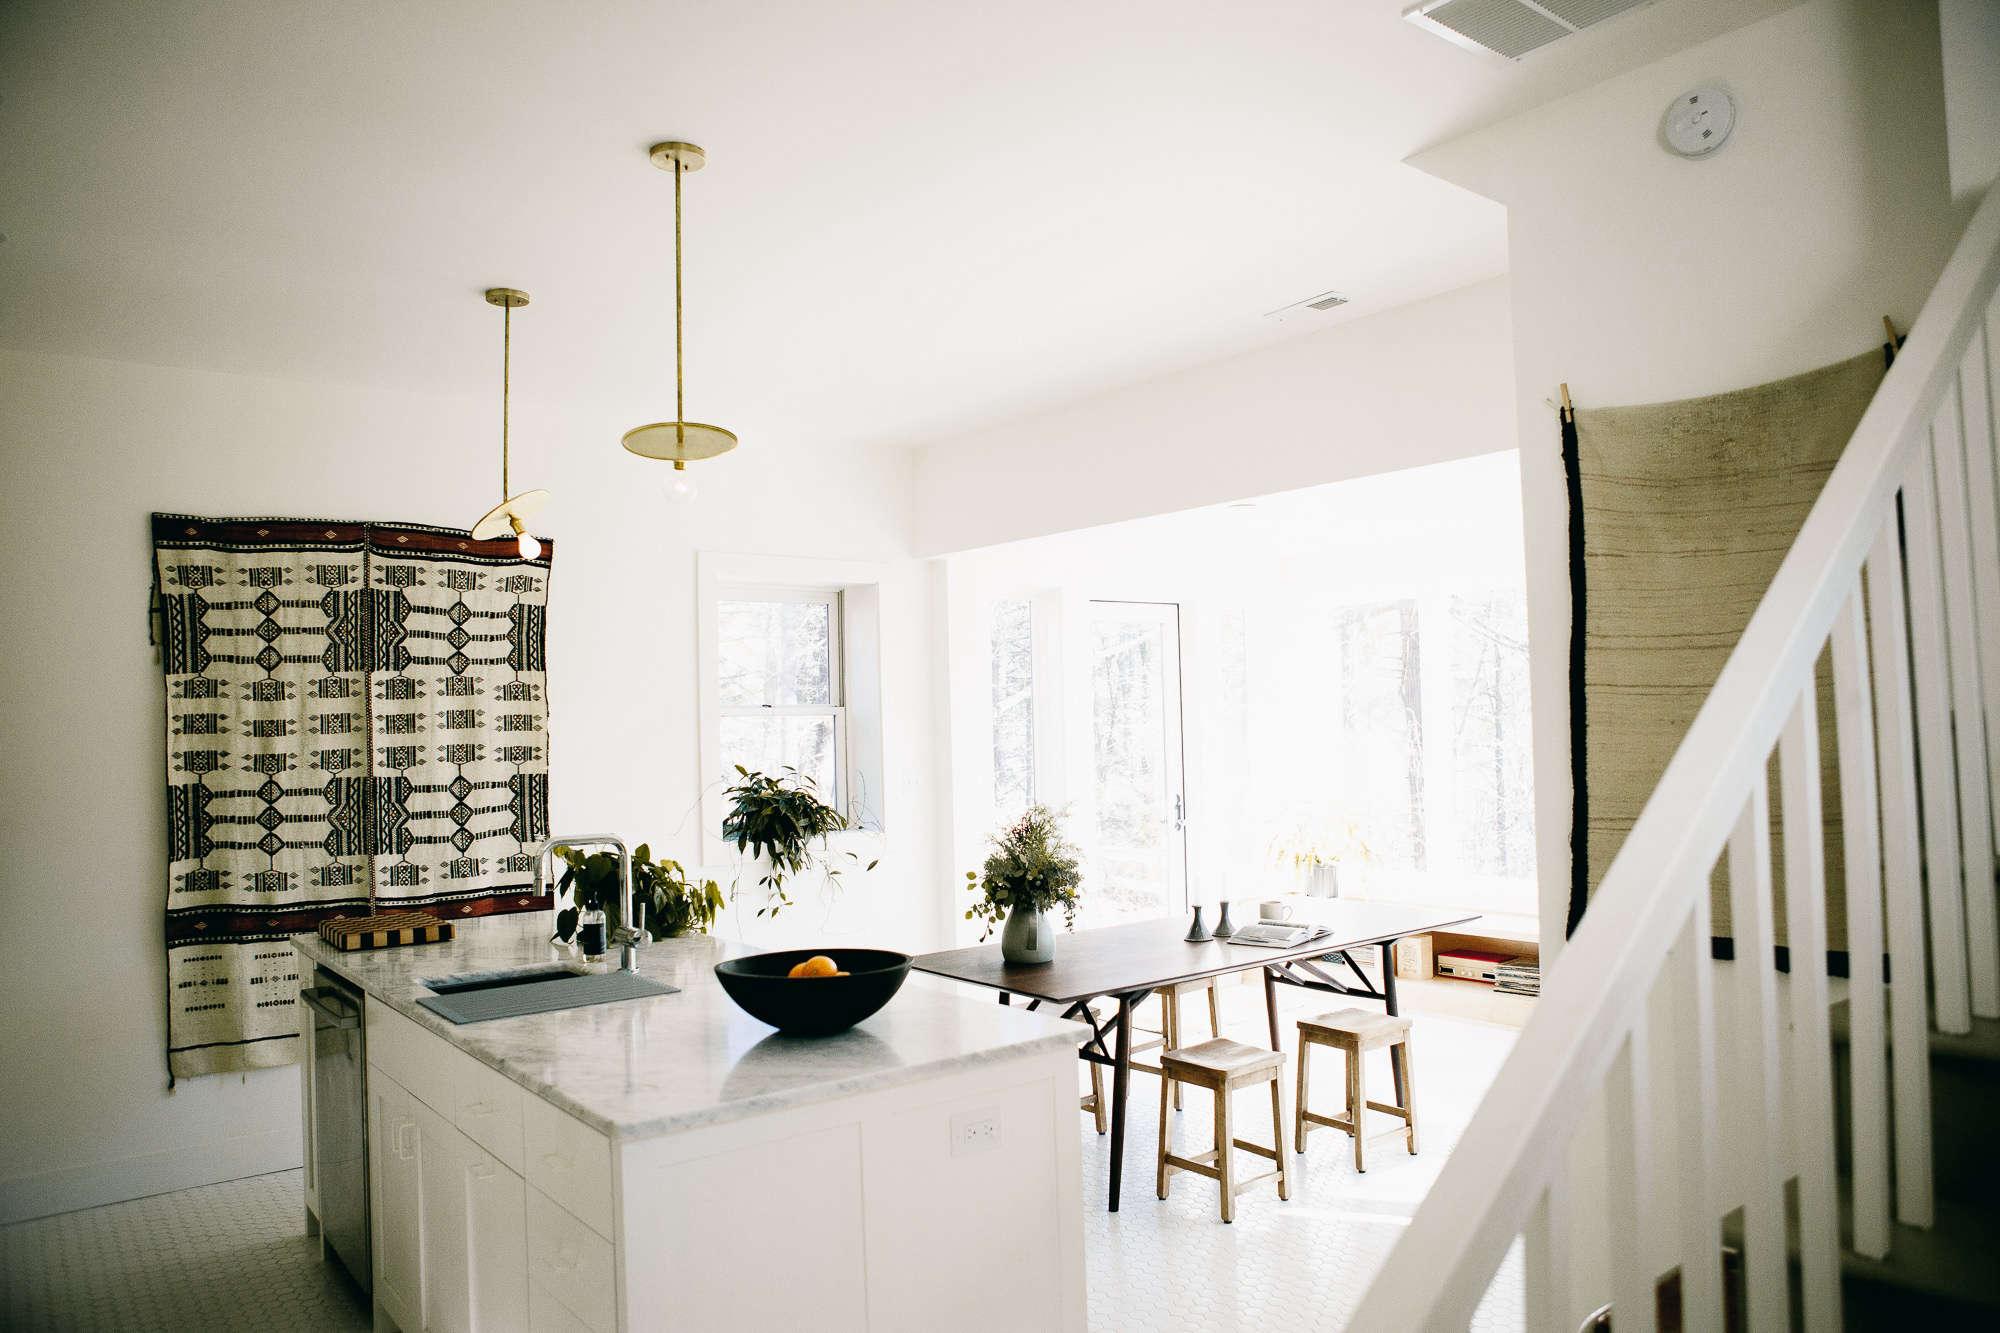 Kitchen of the Week: A Modern Kitchen in a North Carolina Log ...